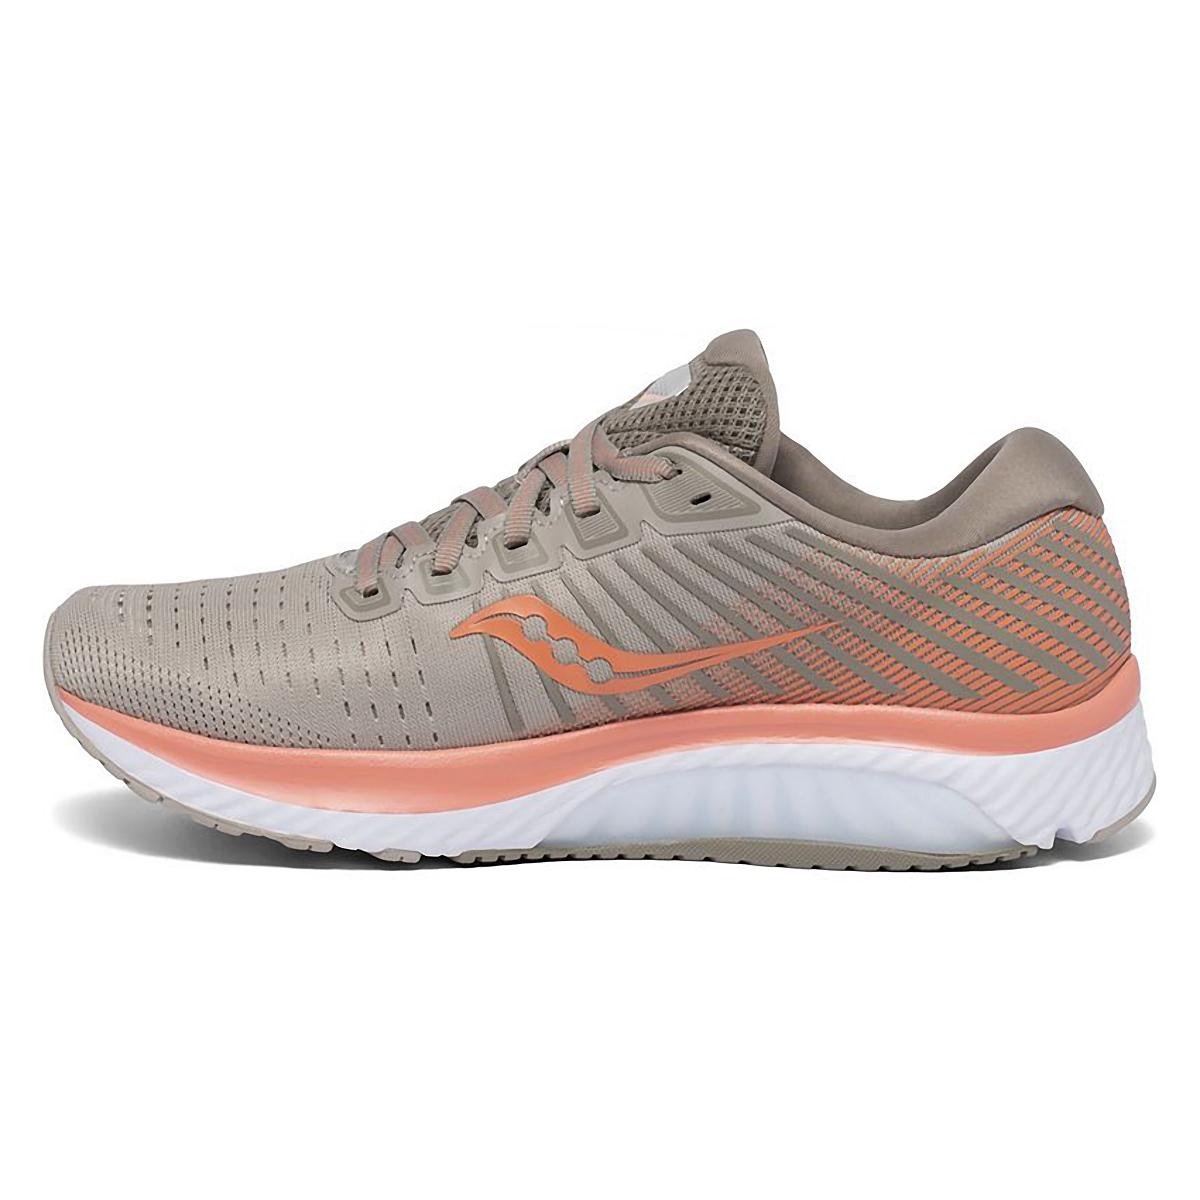 Women's Saucony Gude 13 Running Shoe - Color: Moonrock/Coral - Size: 5 - Width: Regular, Moonrock/Coral, large, image 2